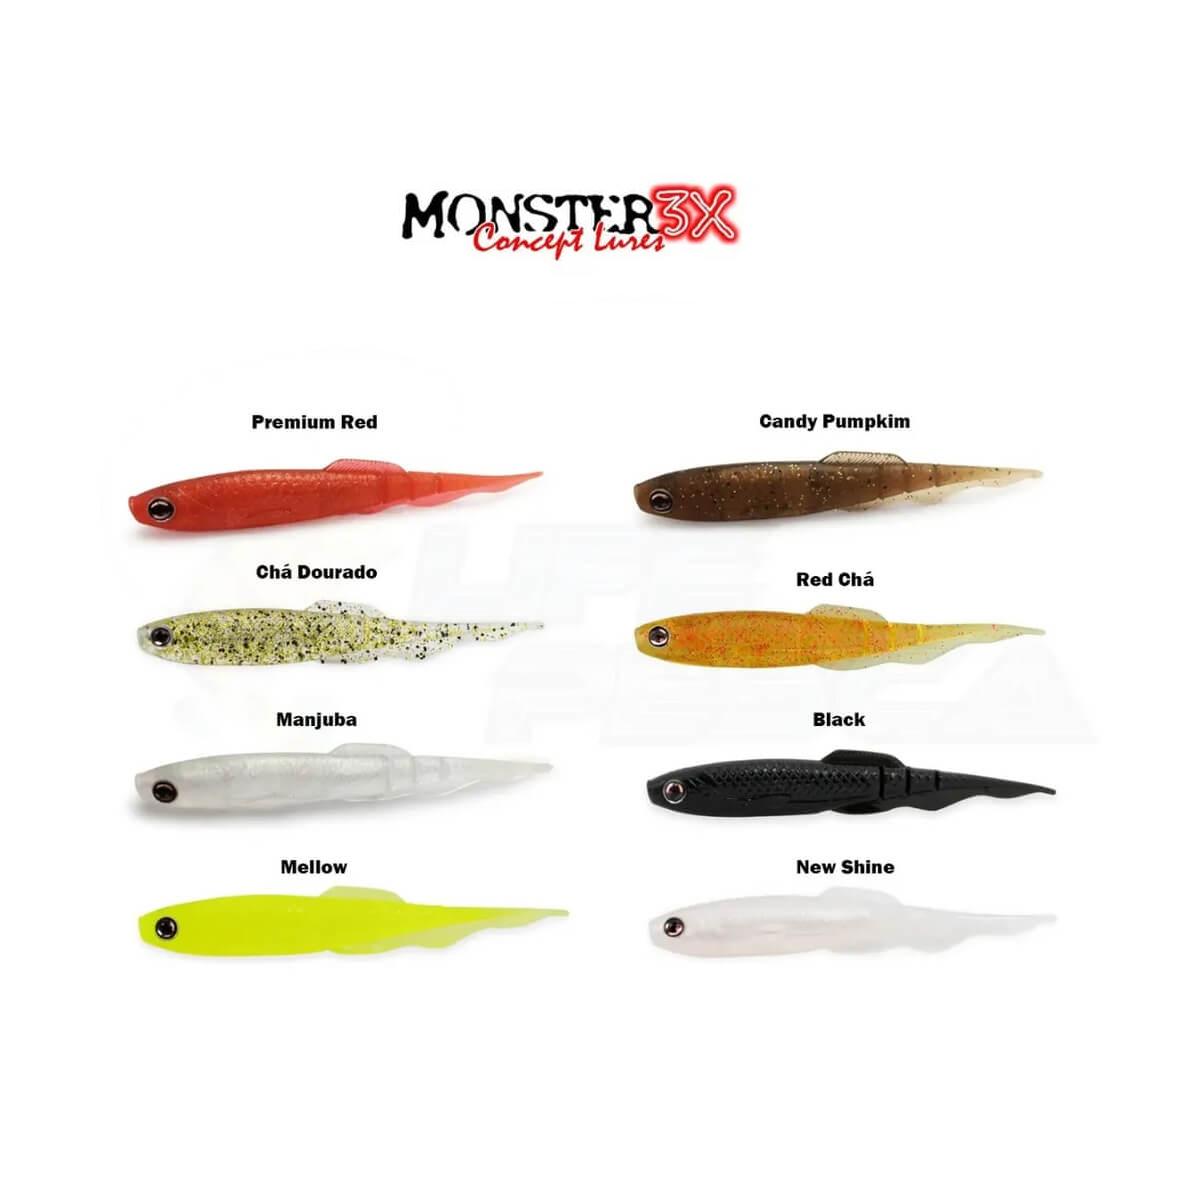 Isca Artificial Soft Monster 3X Bacashad 13cm  - Pró Pesca Shop